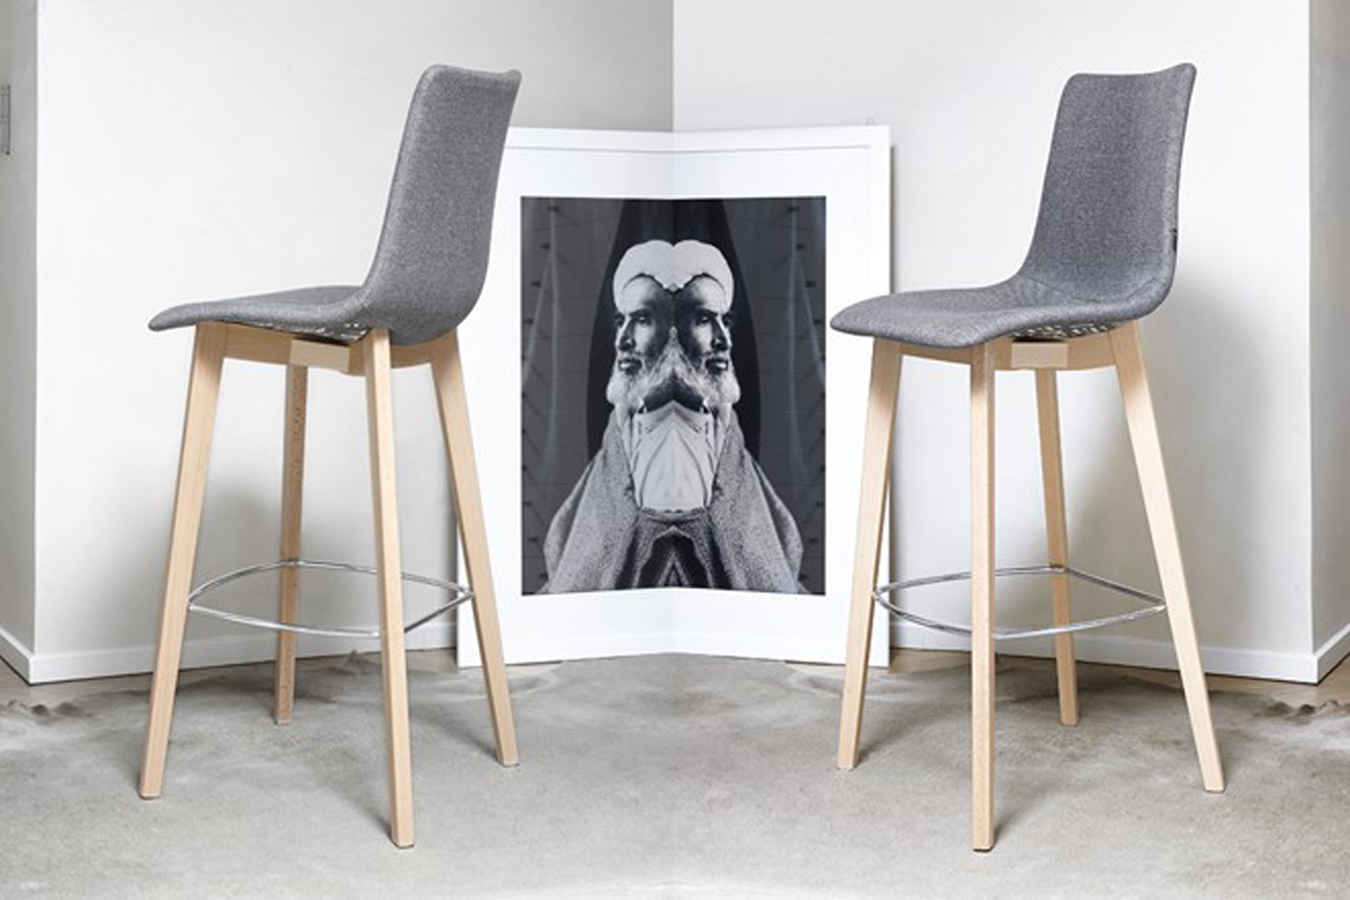 Scab-sgabello-Natural-Zebra-Pop-moderna-design-pranzo-cucina-esterno-stoffa-legno-arredamento-mobili-righetti-novara